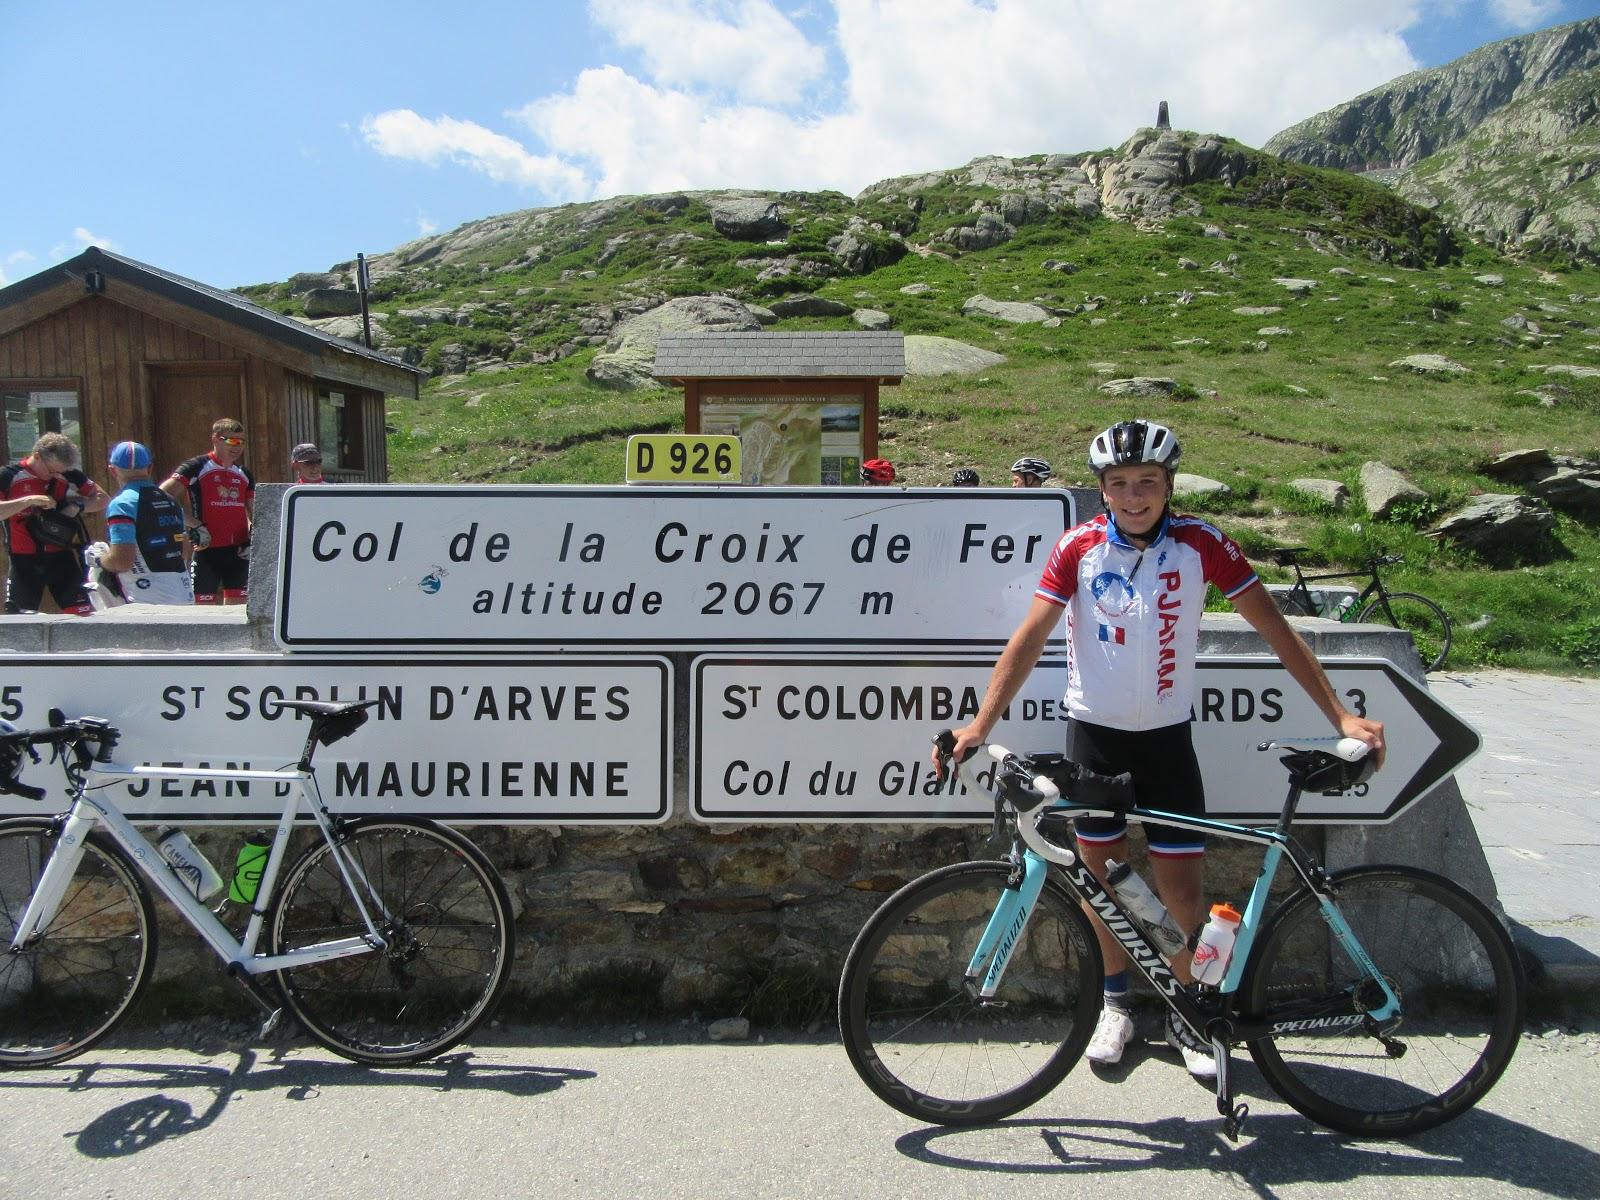 Cycling Col du Glandon, Col de la Croix de Fer sign, PJAMM cycling, bicycle